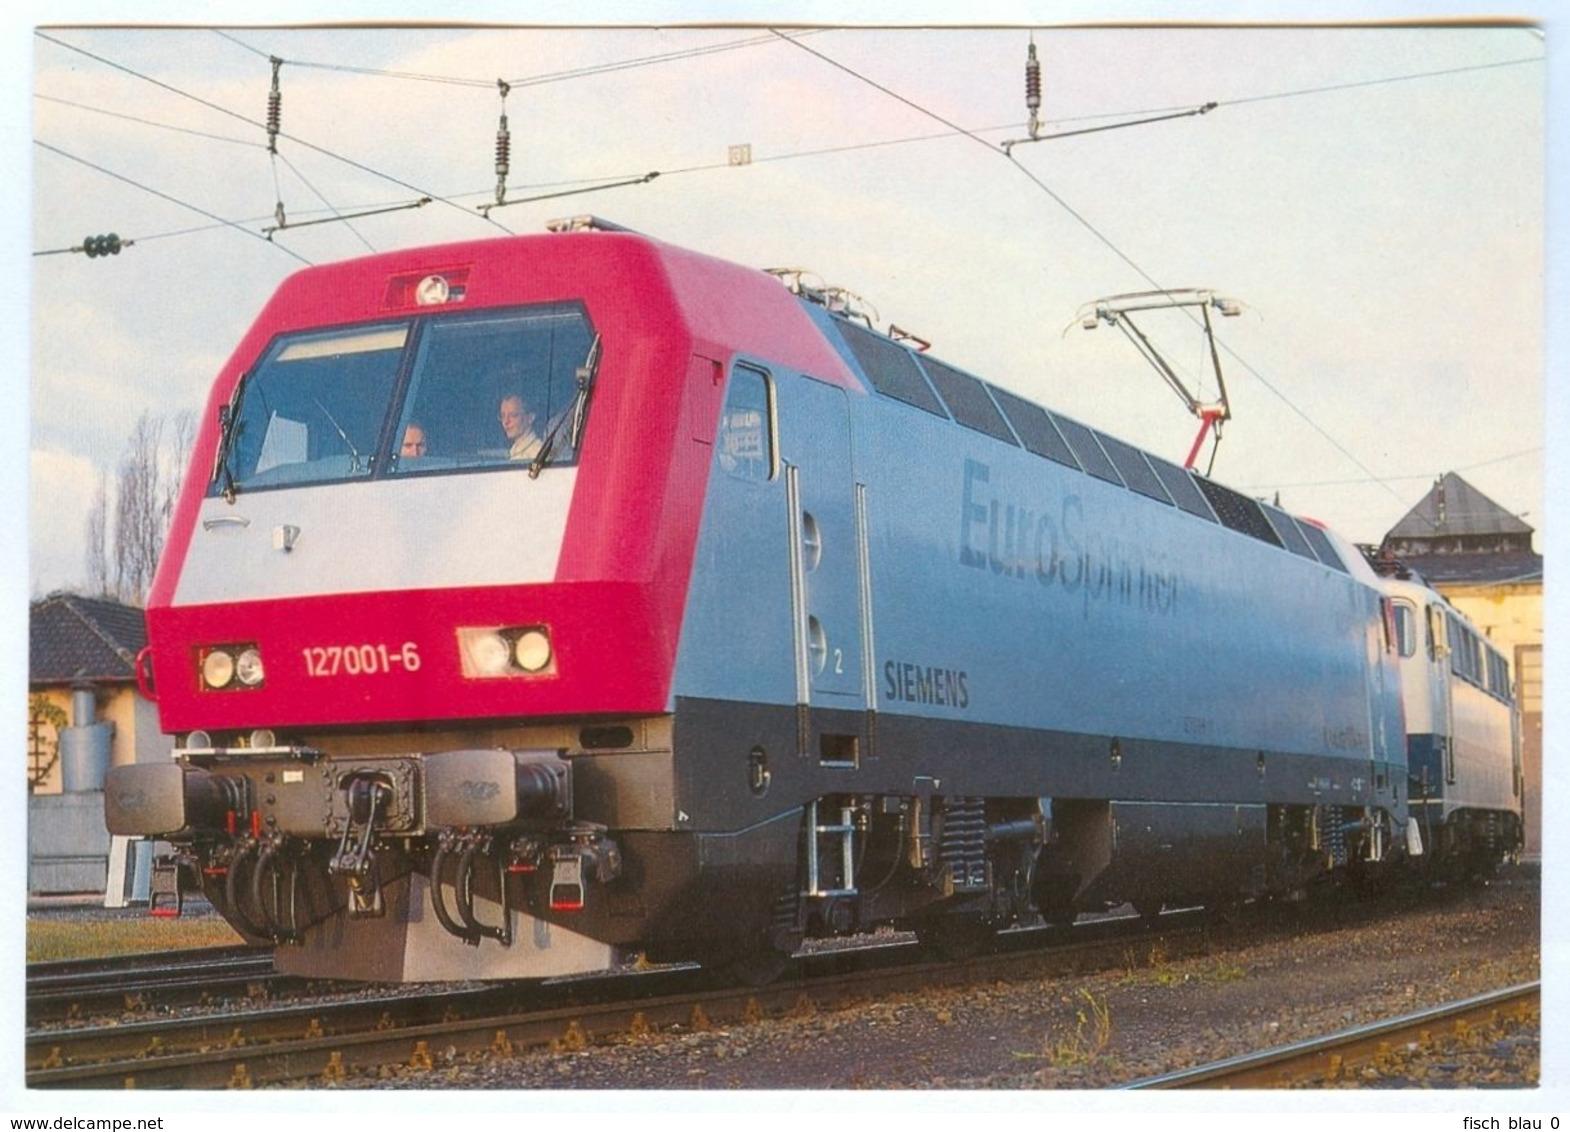 AK Eisenbahn Nürnberg Elektro-Versuchslok 127-001-6 EuroSprinter 1992 REIJU Colorkarte DB Franken Deutschland - Trenes